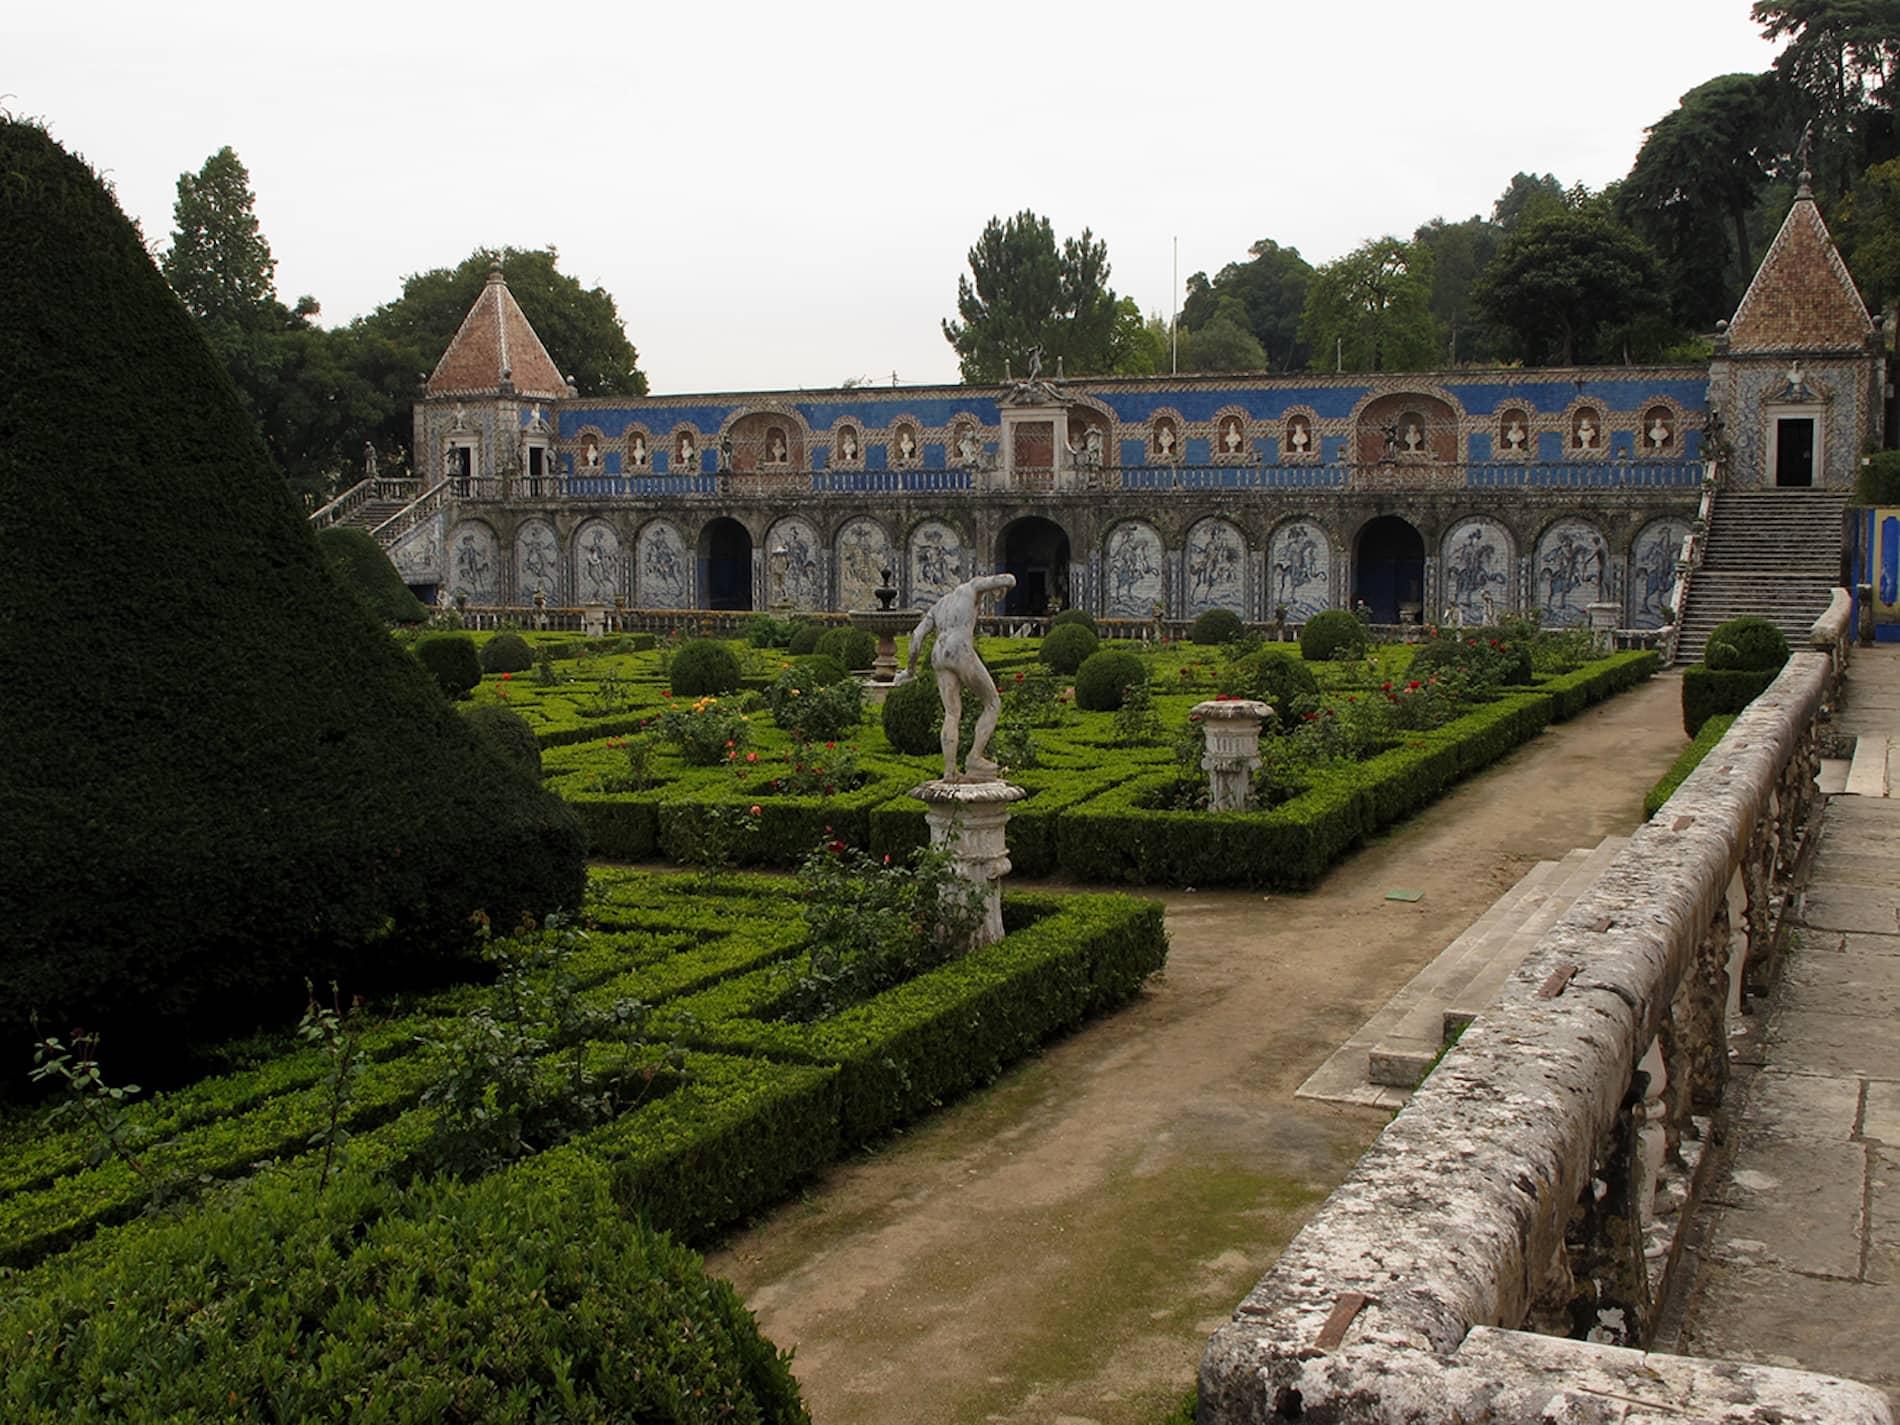 jardim-fronteira-lisboa-1